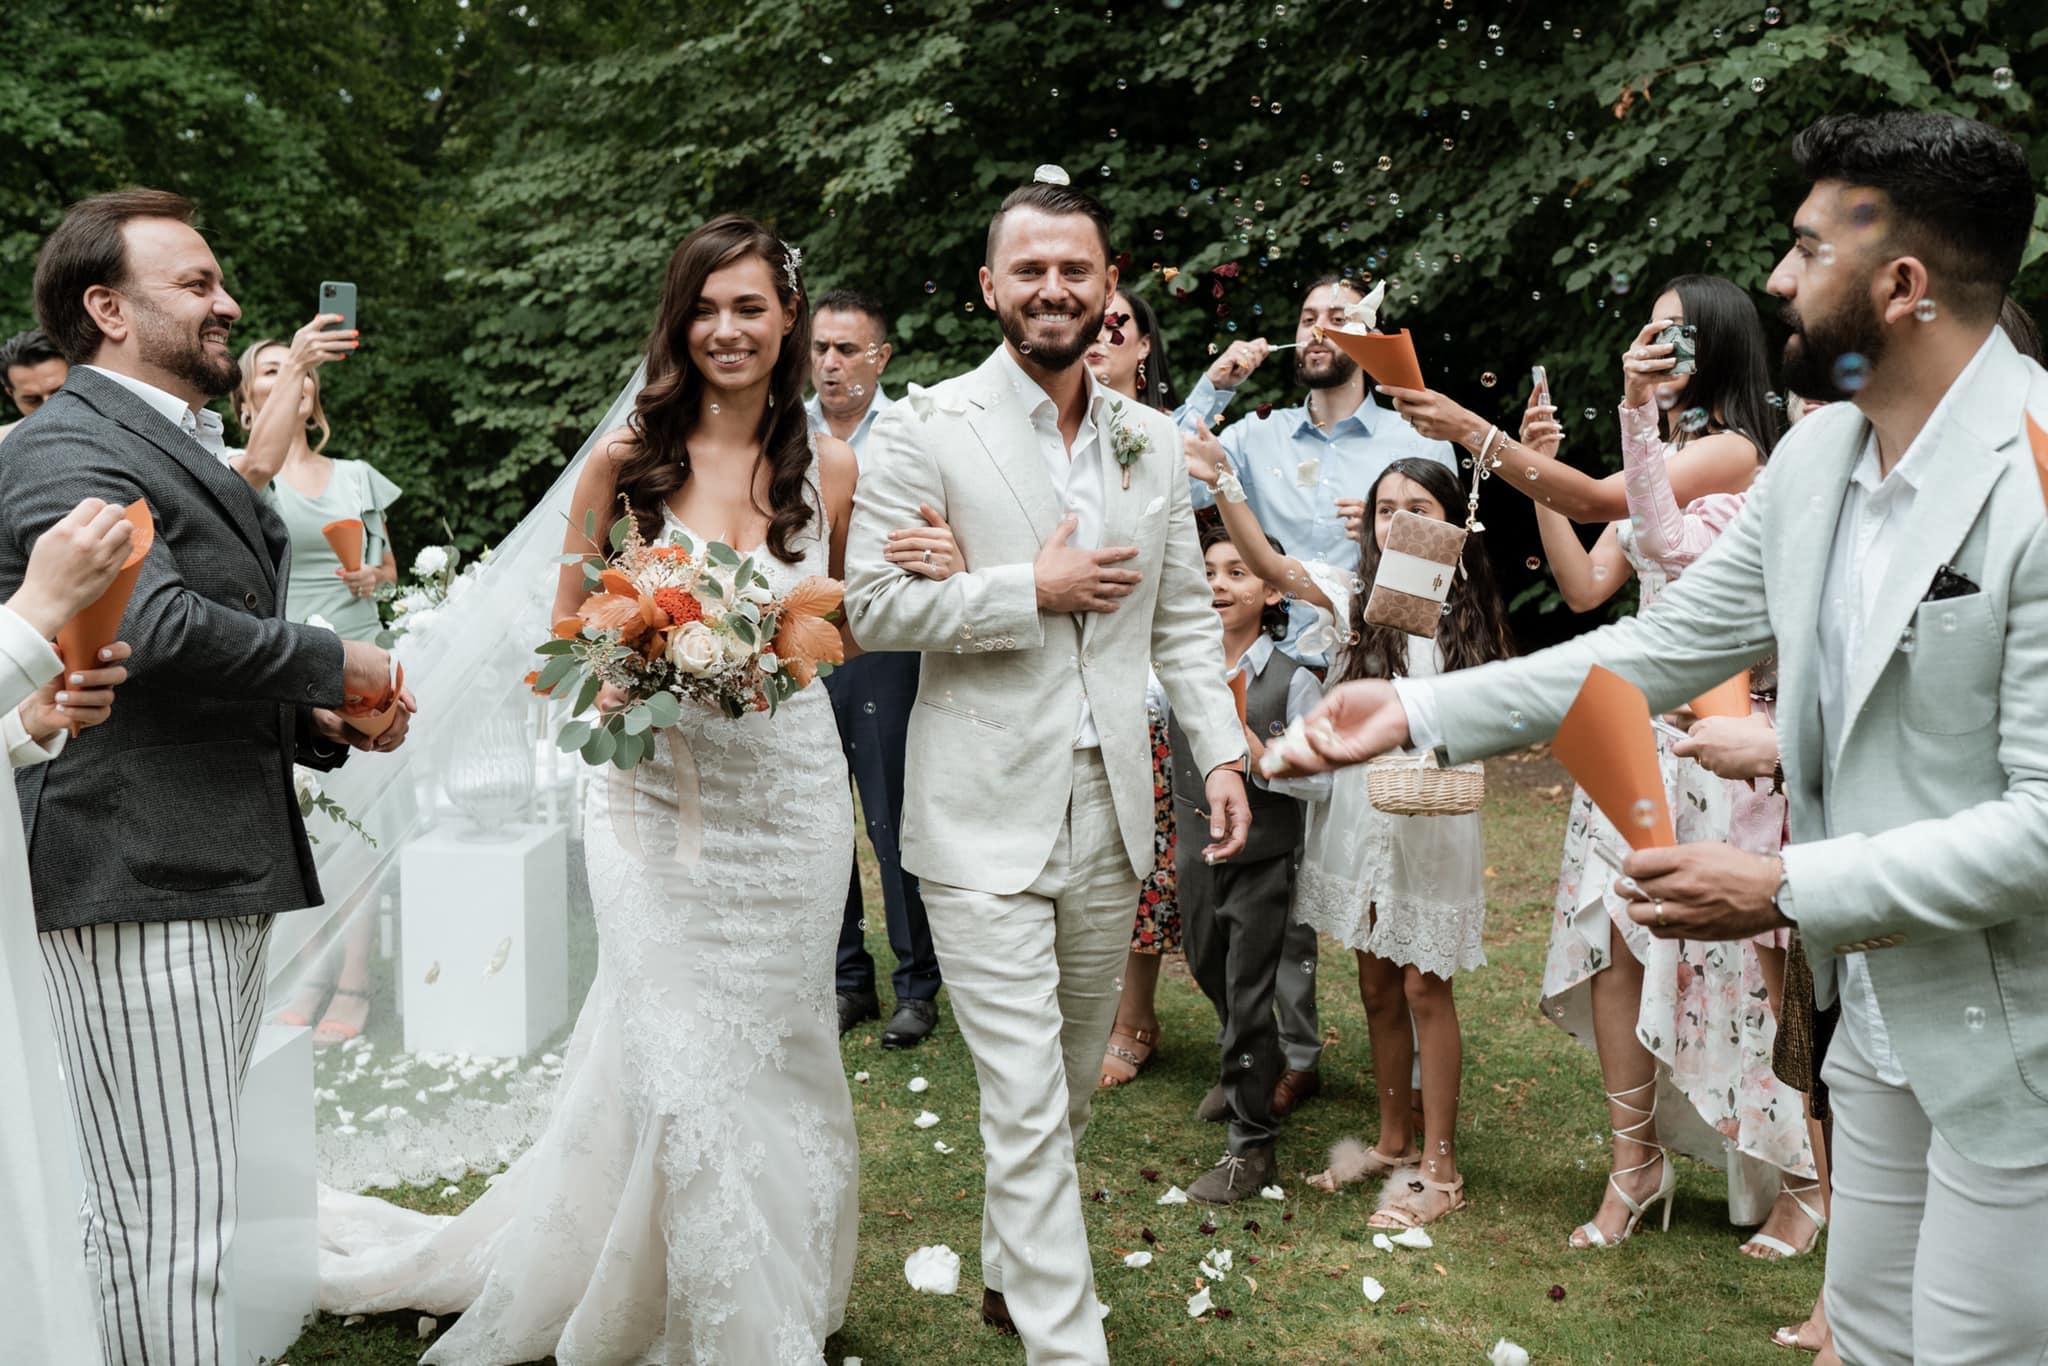 Wedding Award Germany 2021 - Brautpaar Spalier